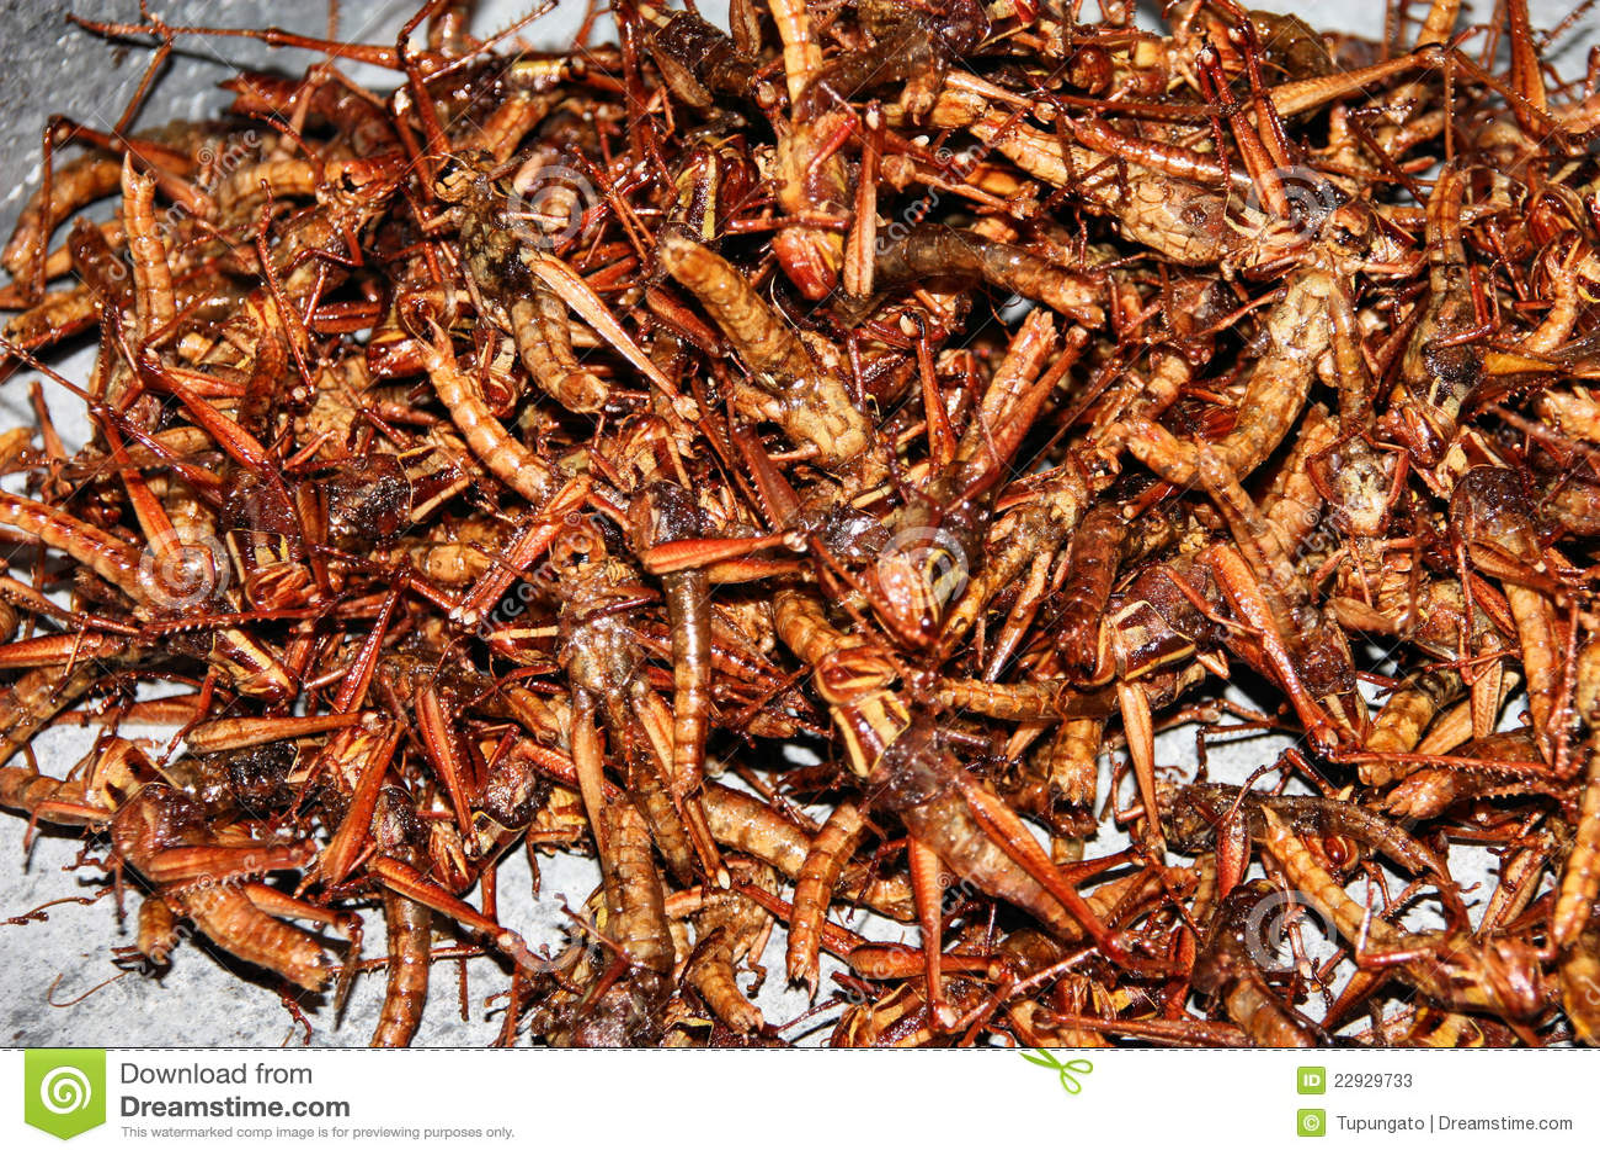 Fried Crickets Stock Photos  Image 22929733